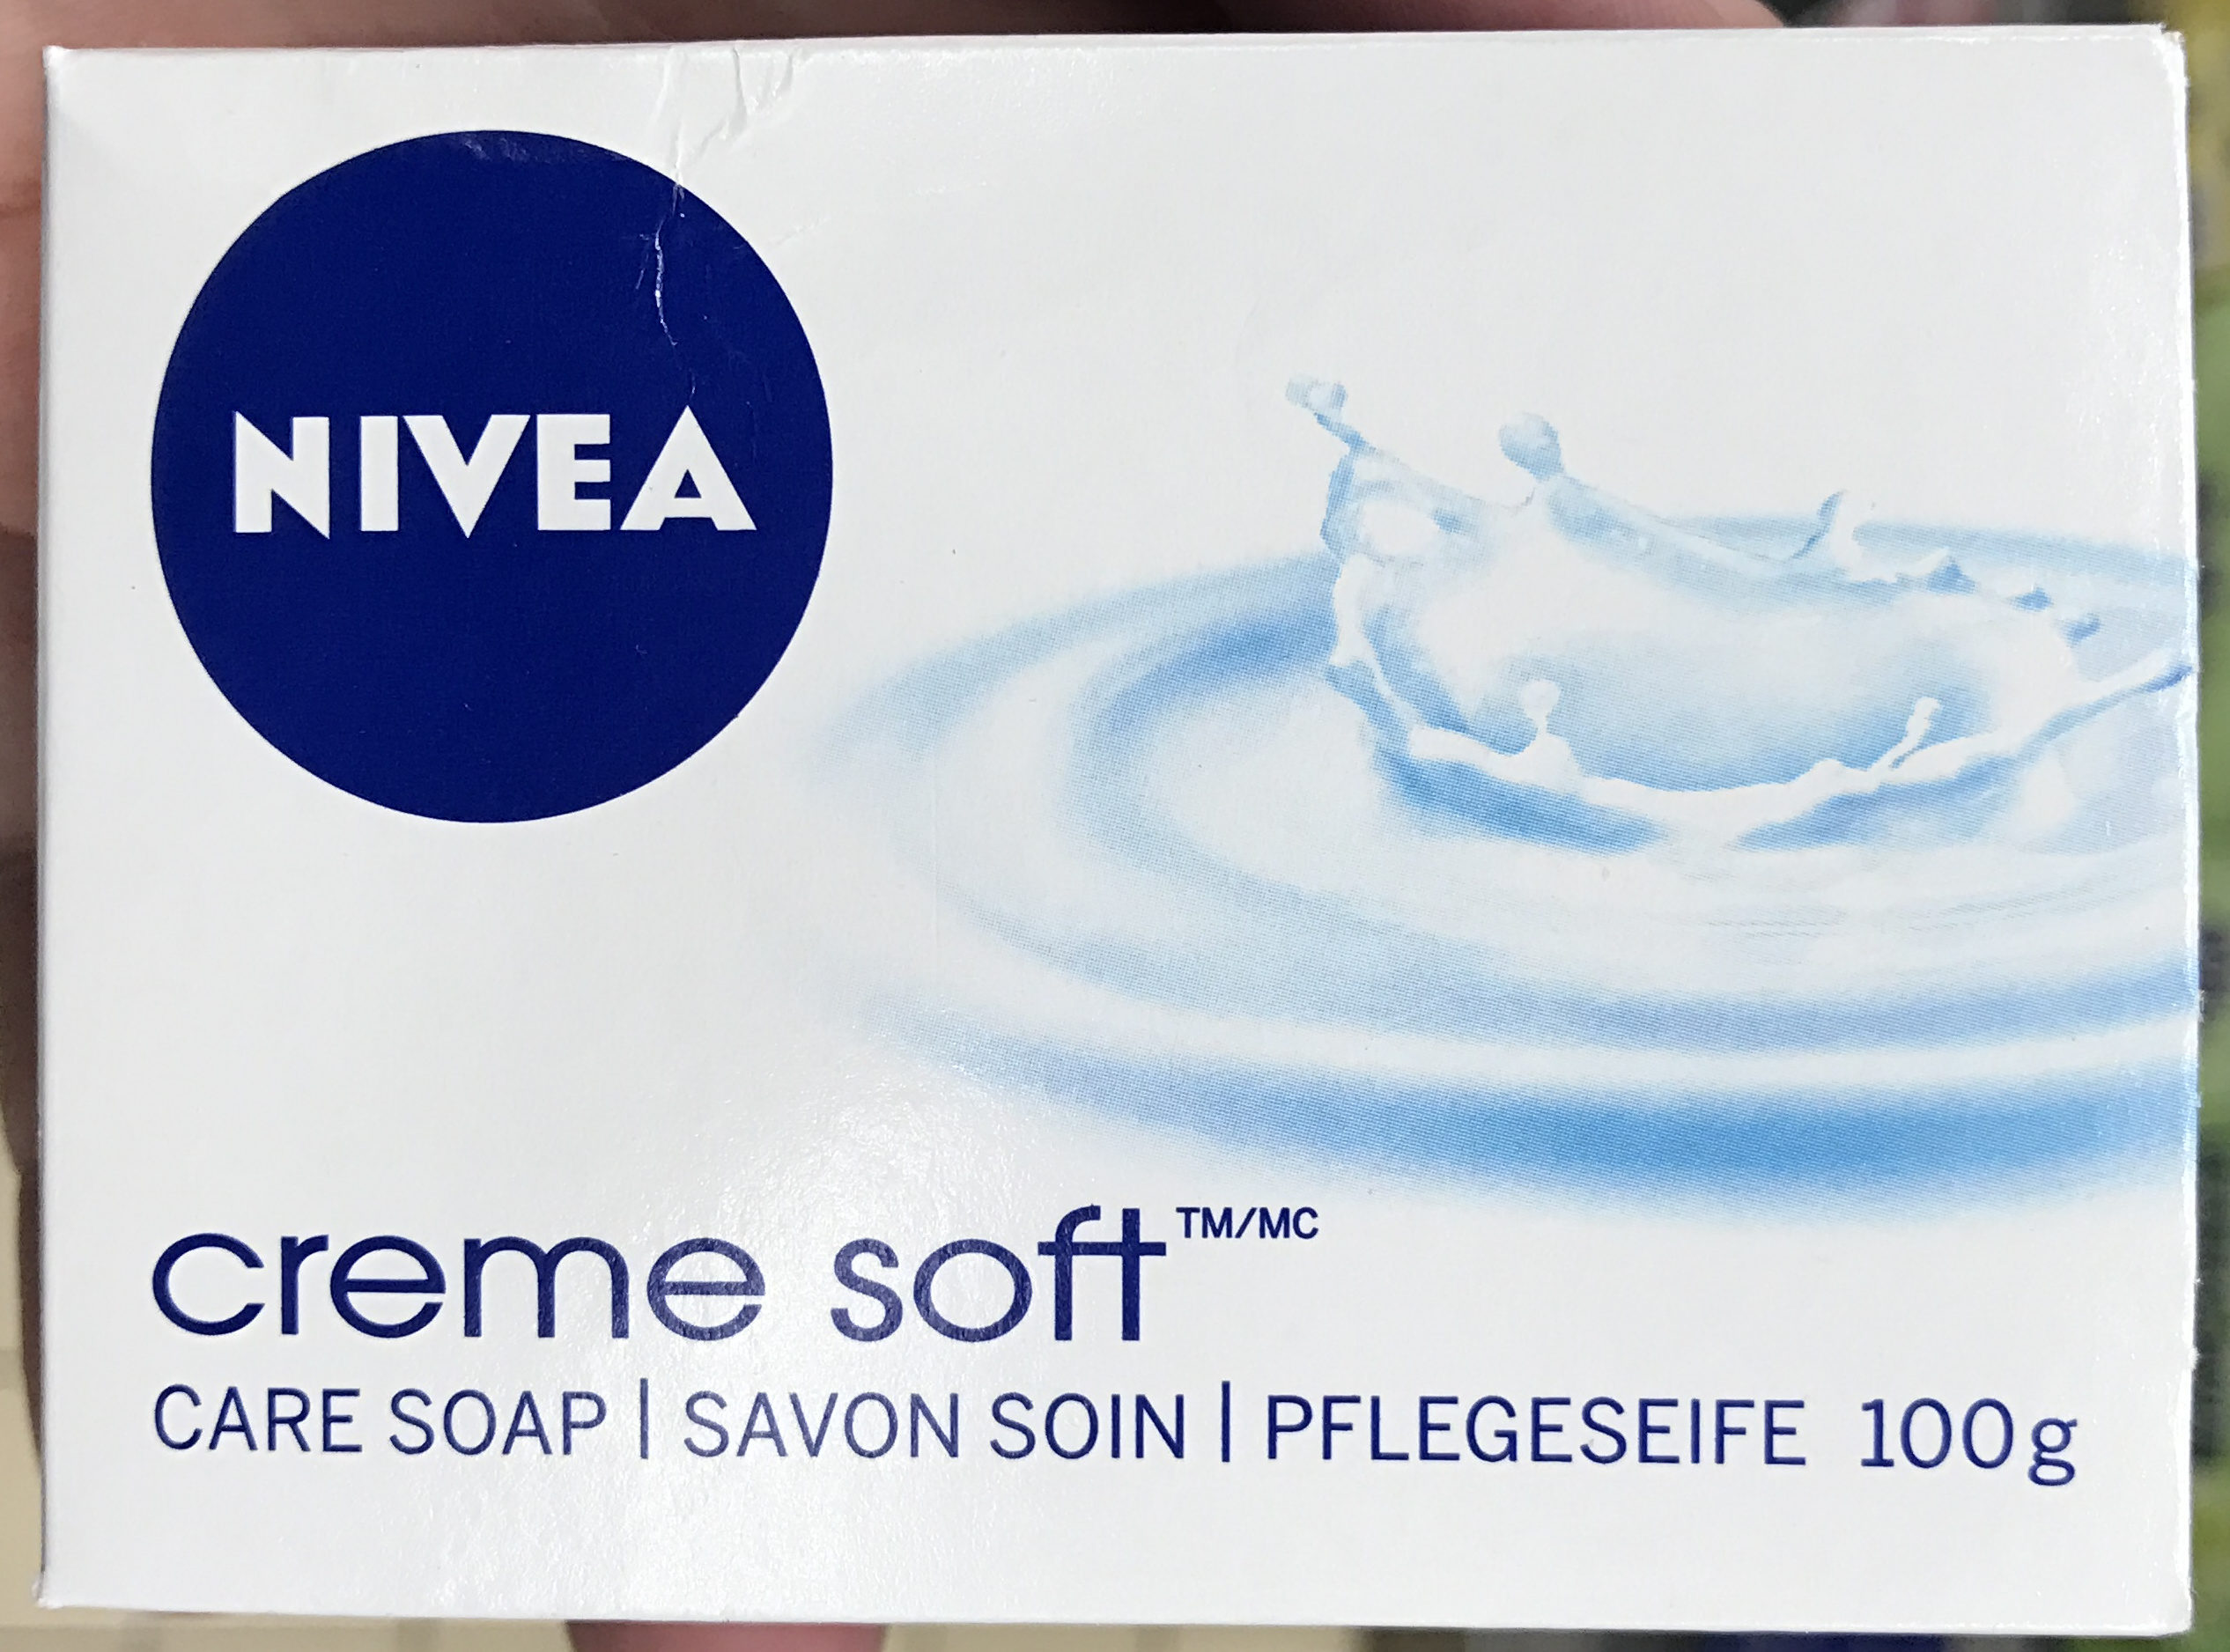 Creme Soft Savon Soin - Product - fr